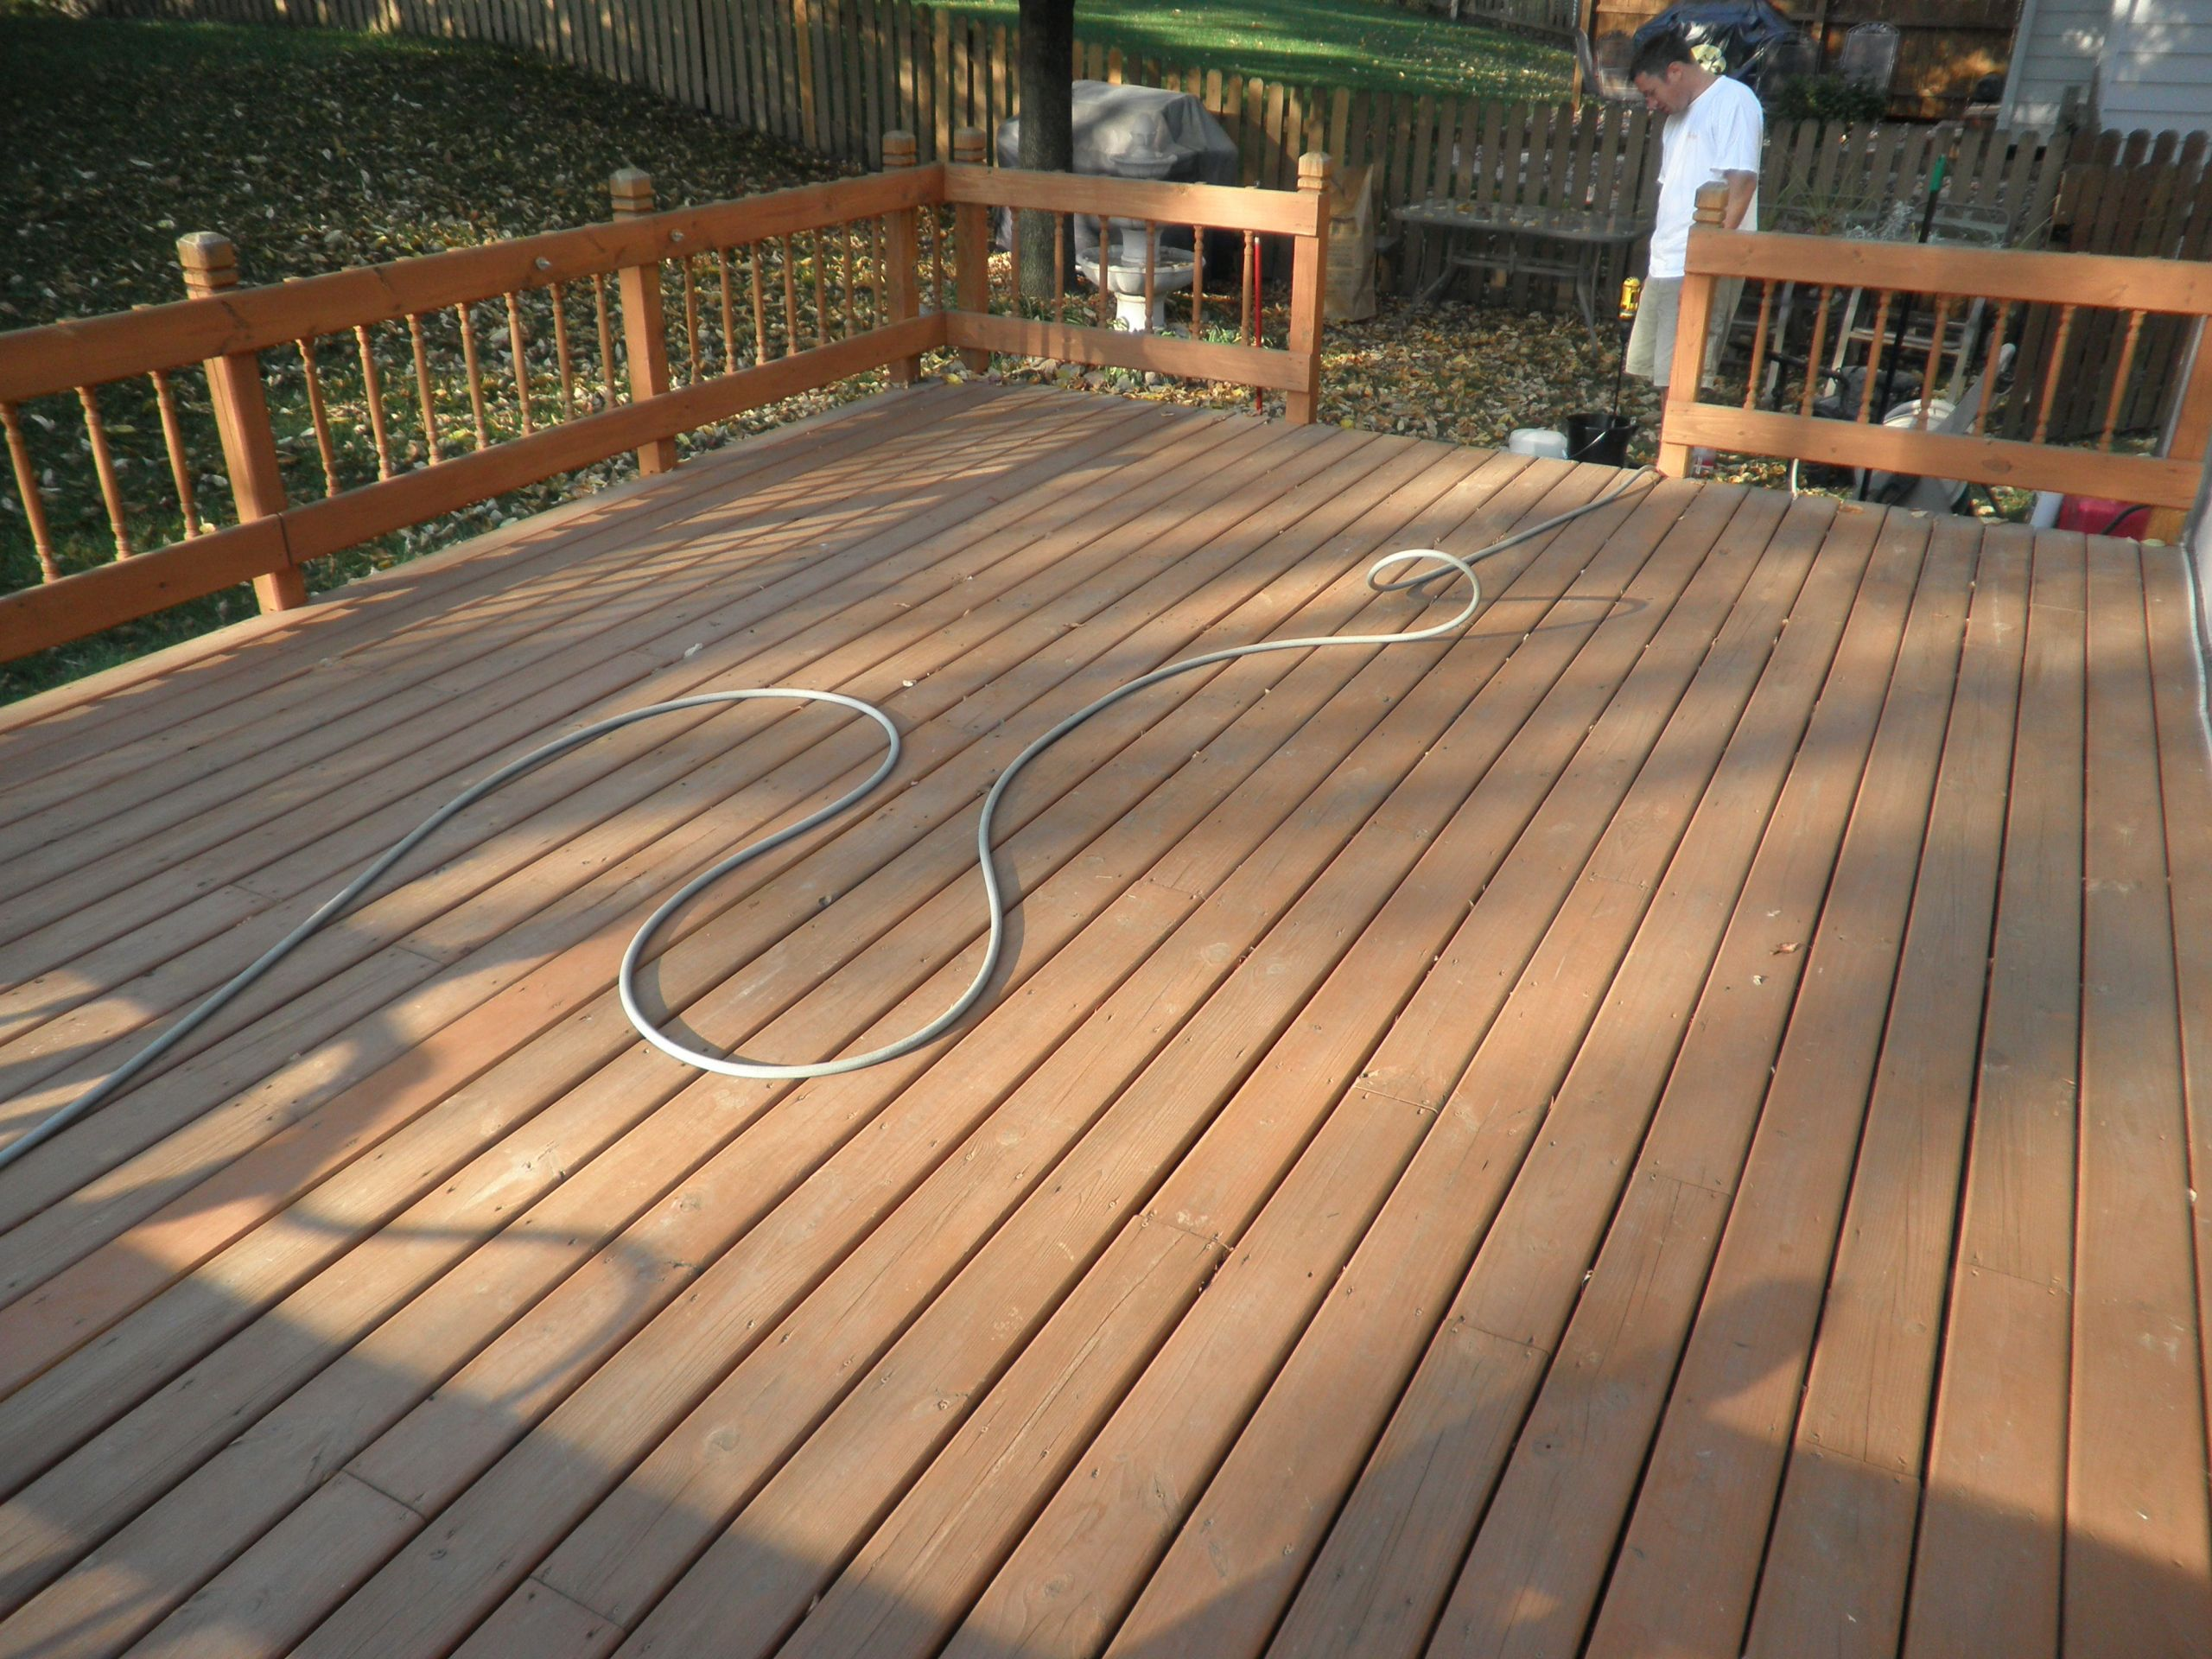 Lowes Deck Paint Restore  Decking Deck Restore Reviews For Outdoor Home Design